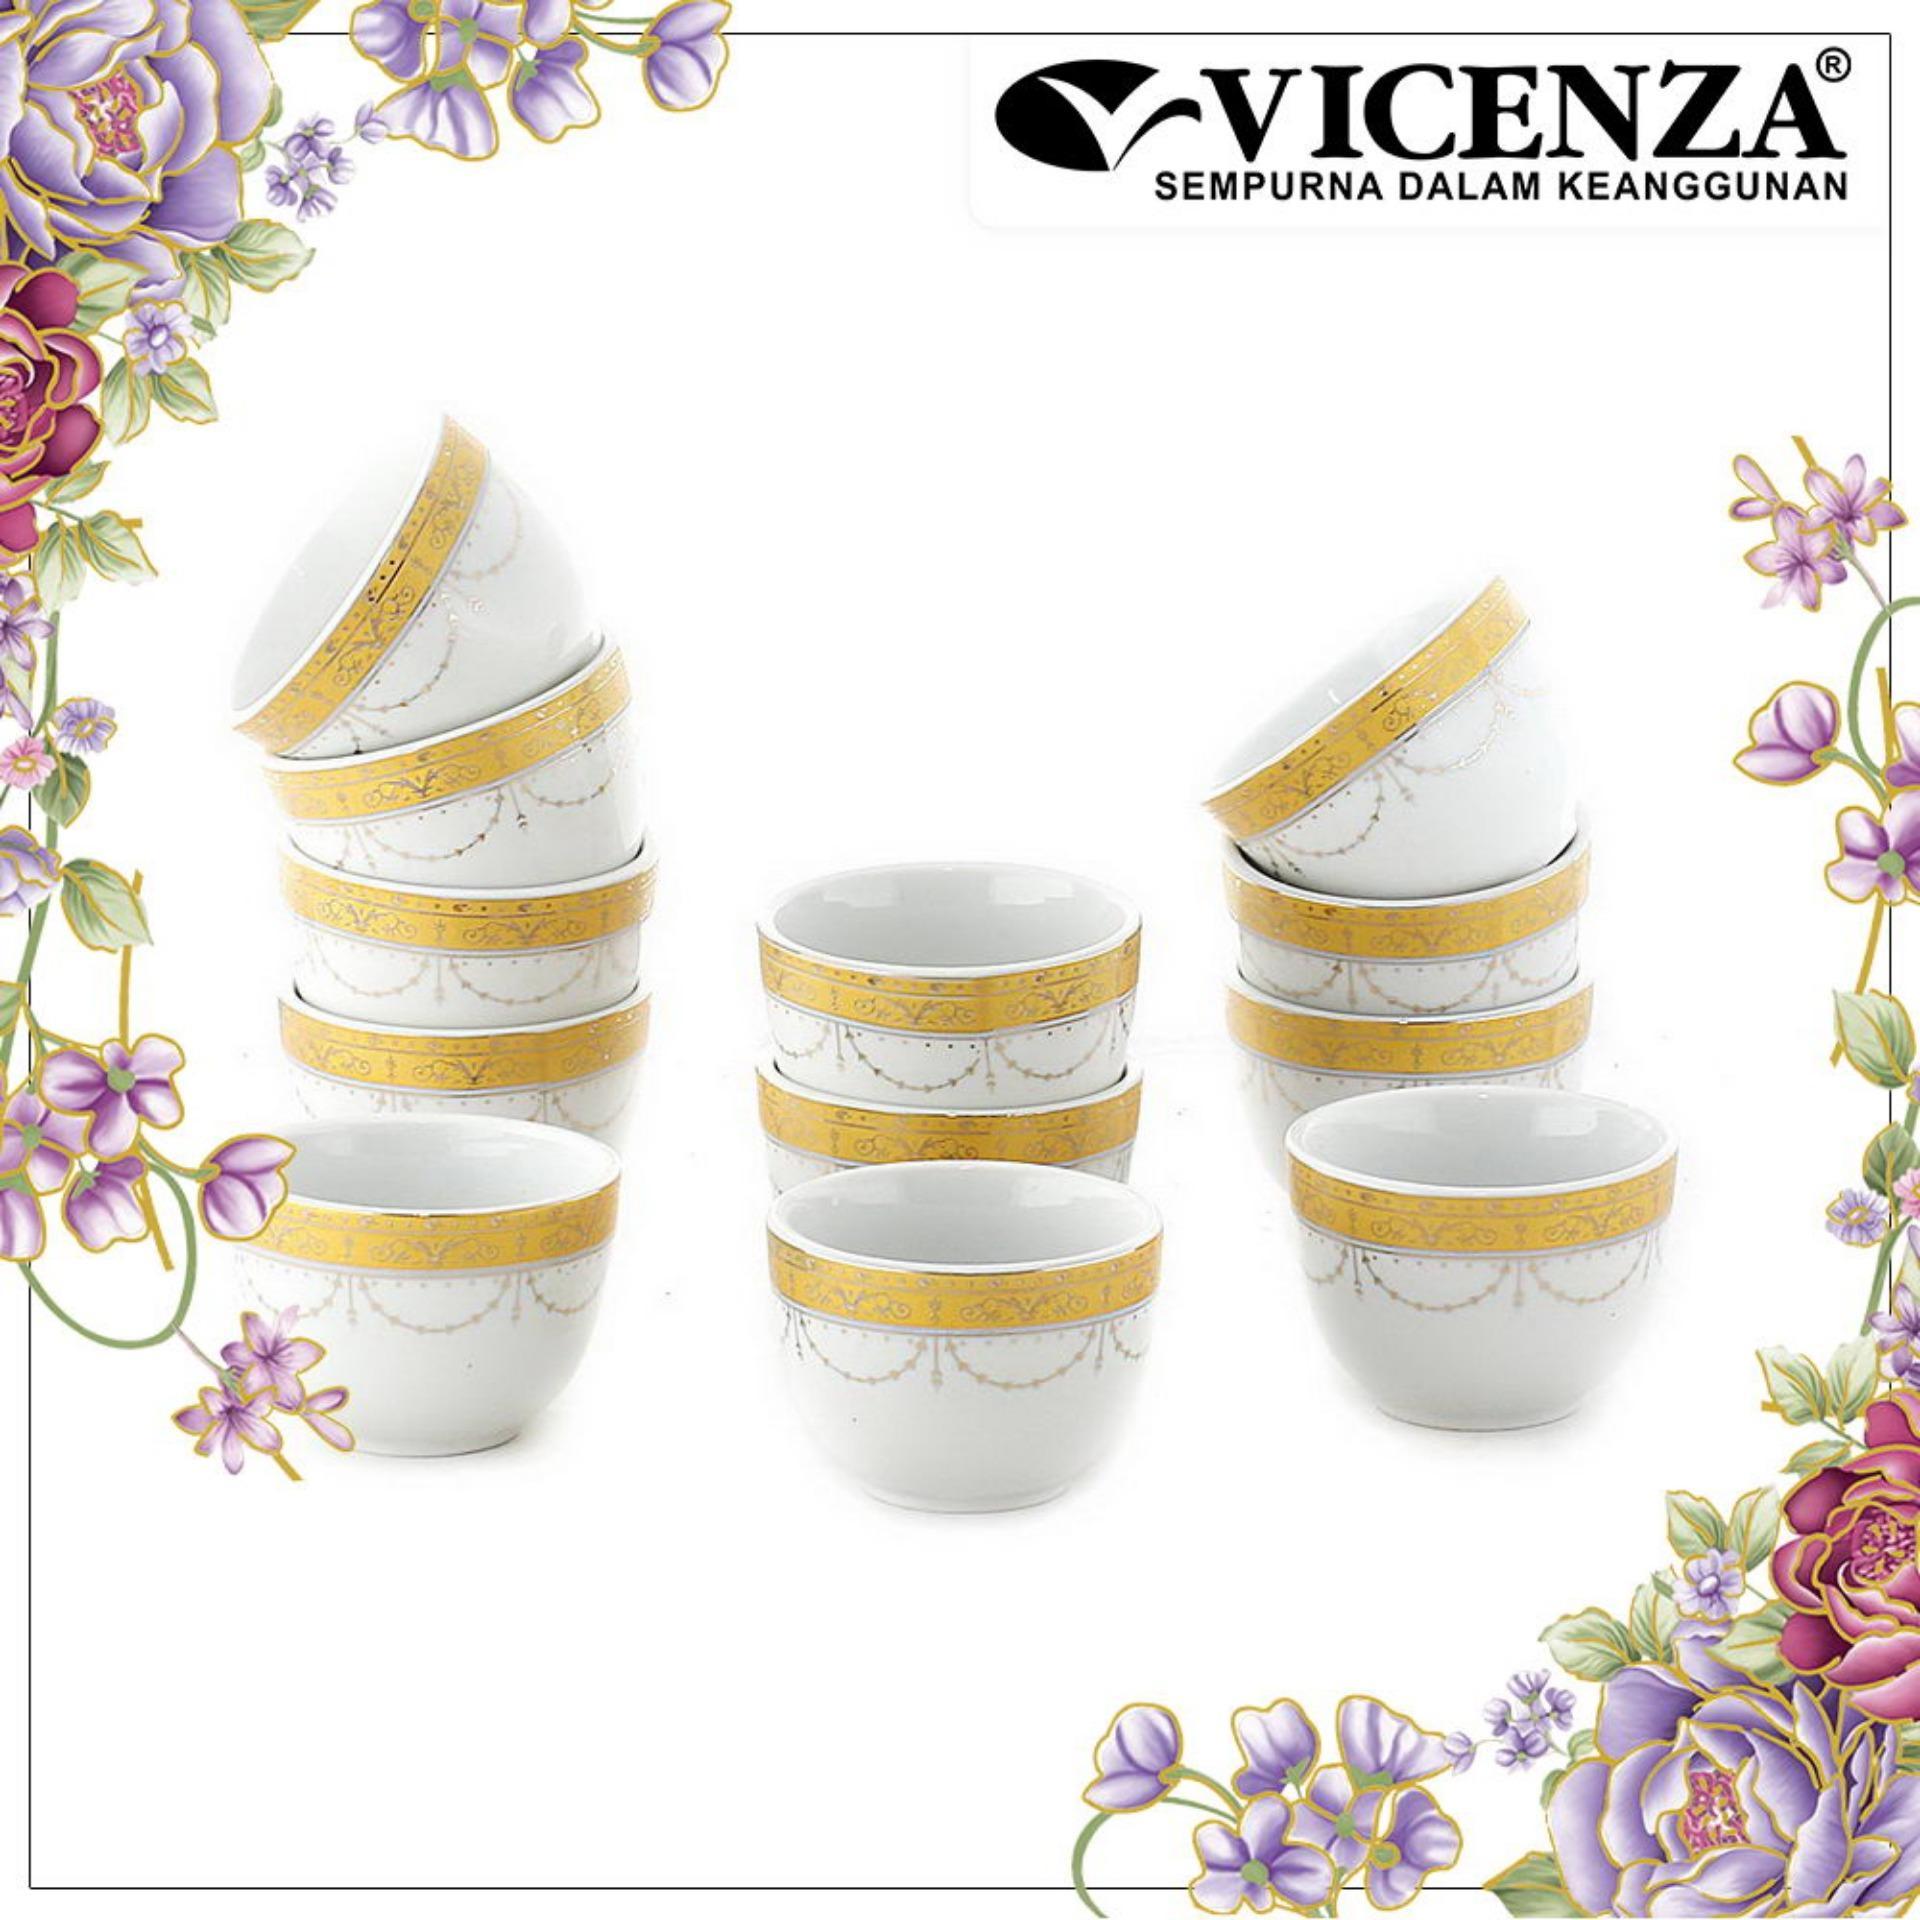 Toko Vicenza Tableware C111 Cangkir Kecil Small Cup Online Di Dki Jakarta